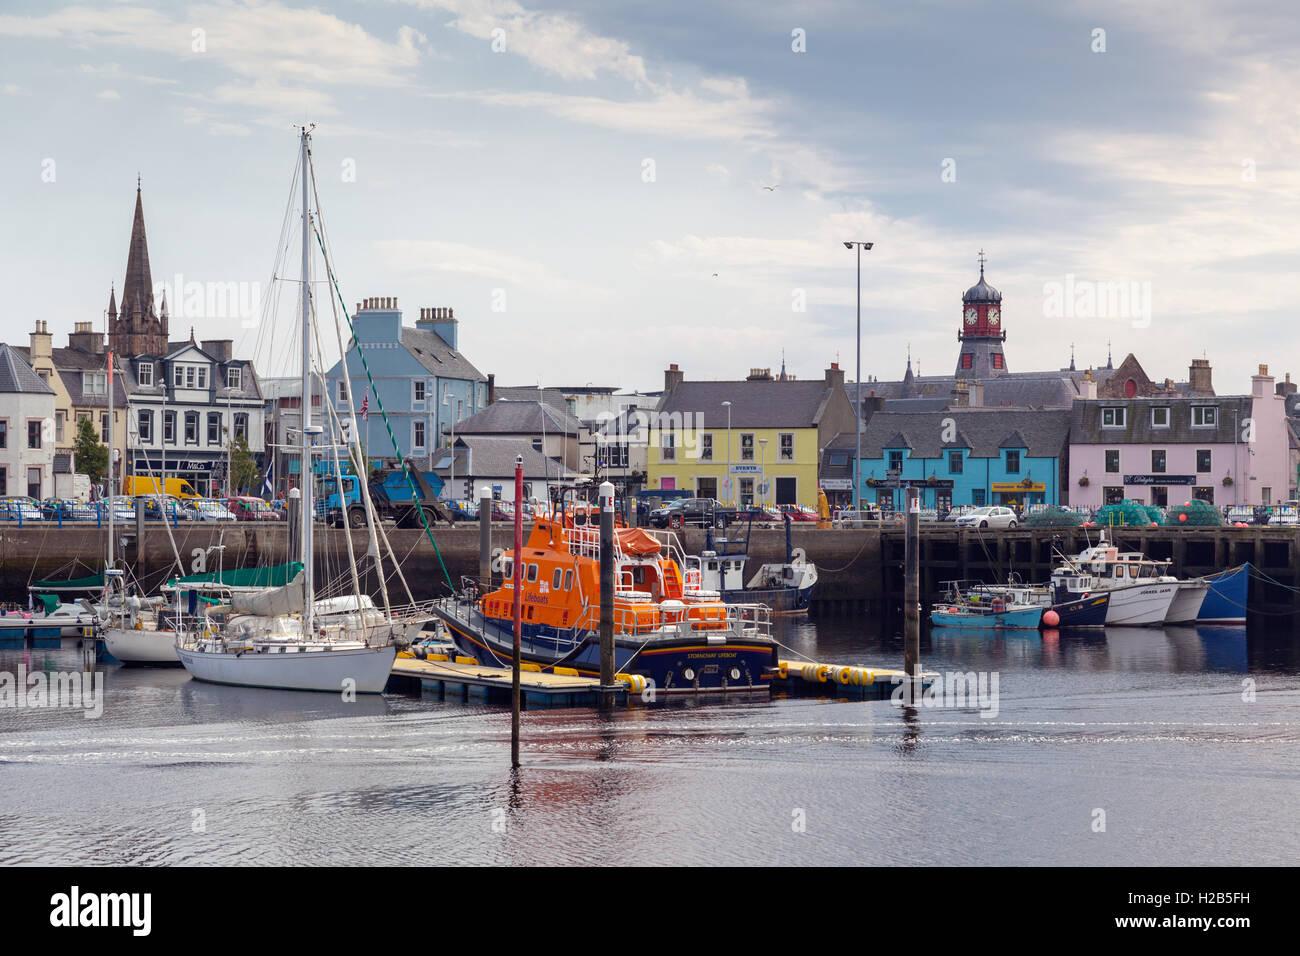 Isle of Lewis, Outer Hebrides, Scotland Stornoway Harbour - Stock Image